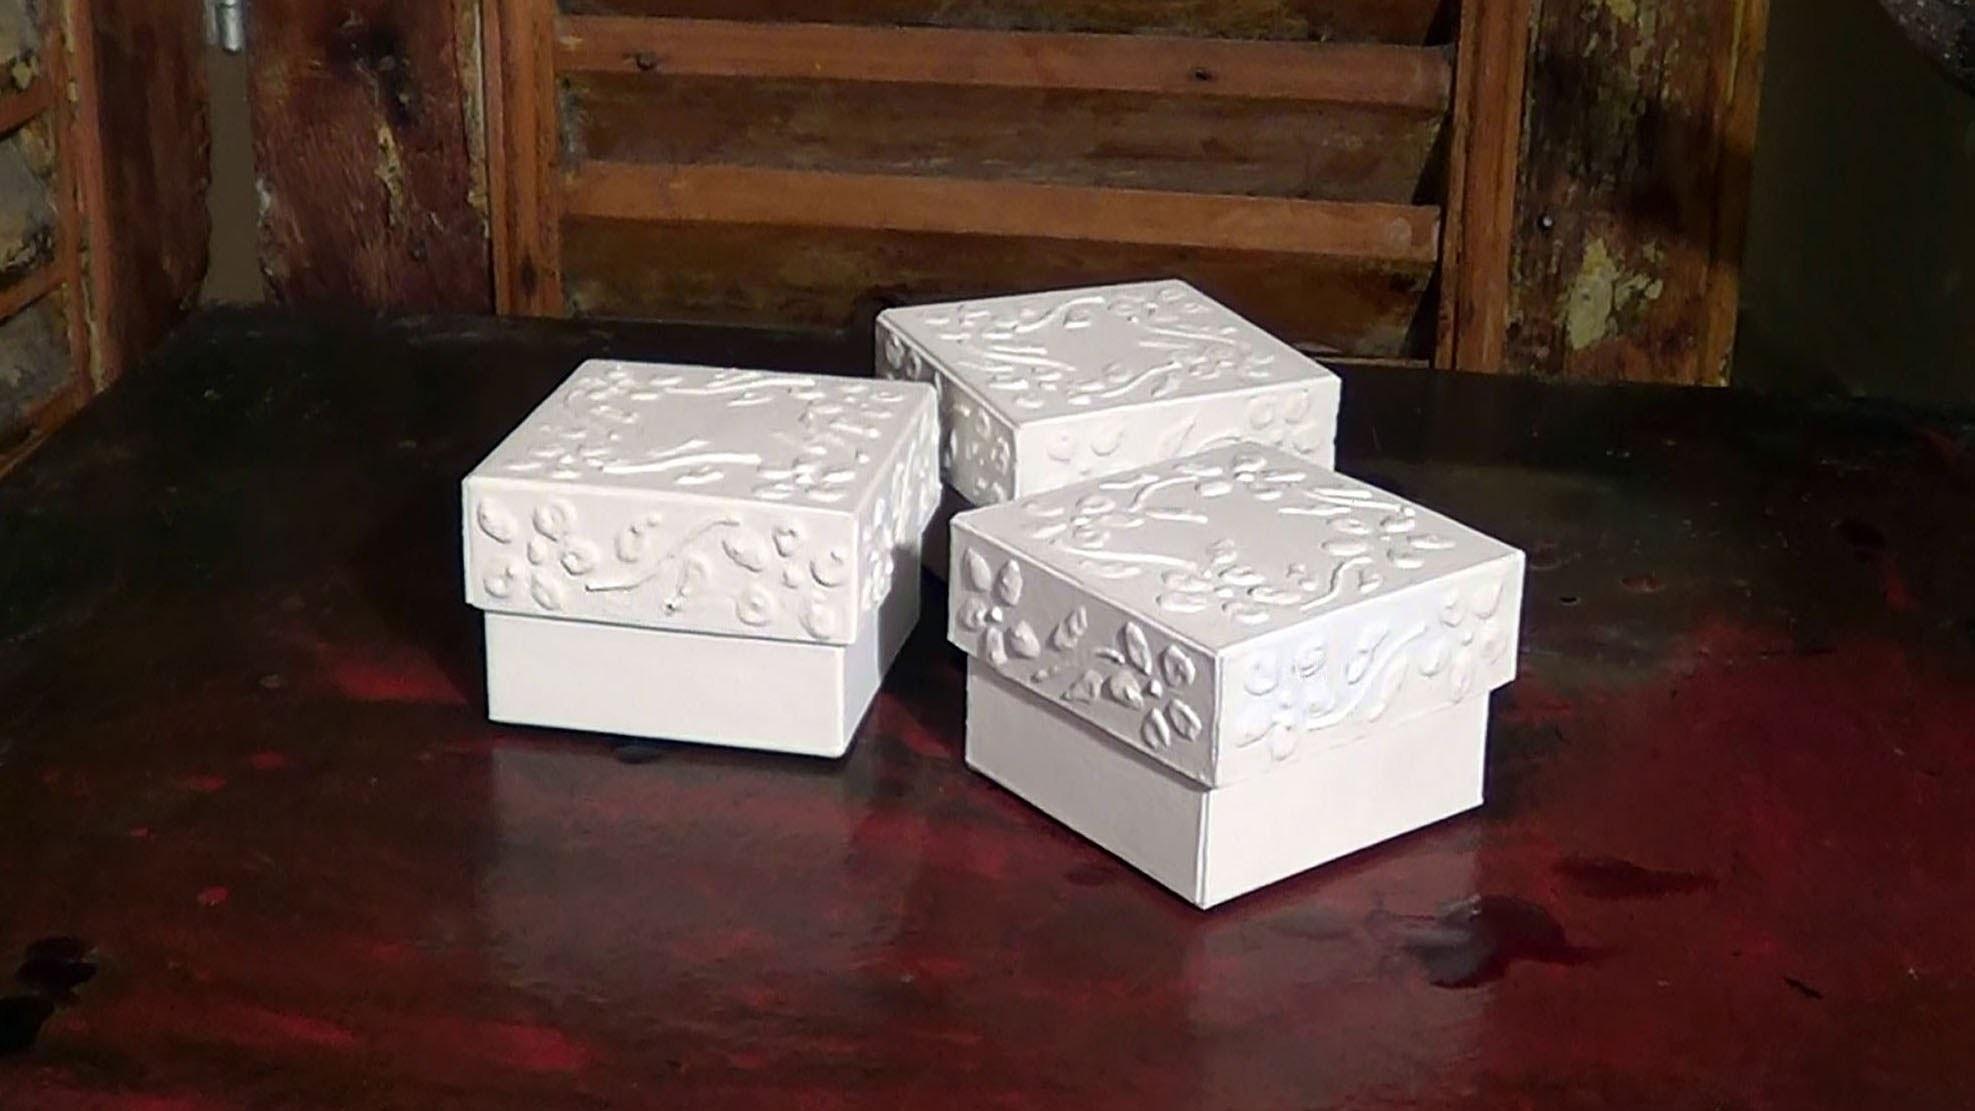 DIY - Caixa de lembranças - Remembrance box - Cajitas de recuerdo